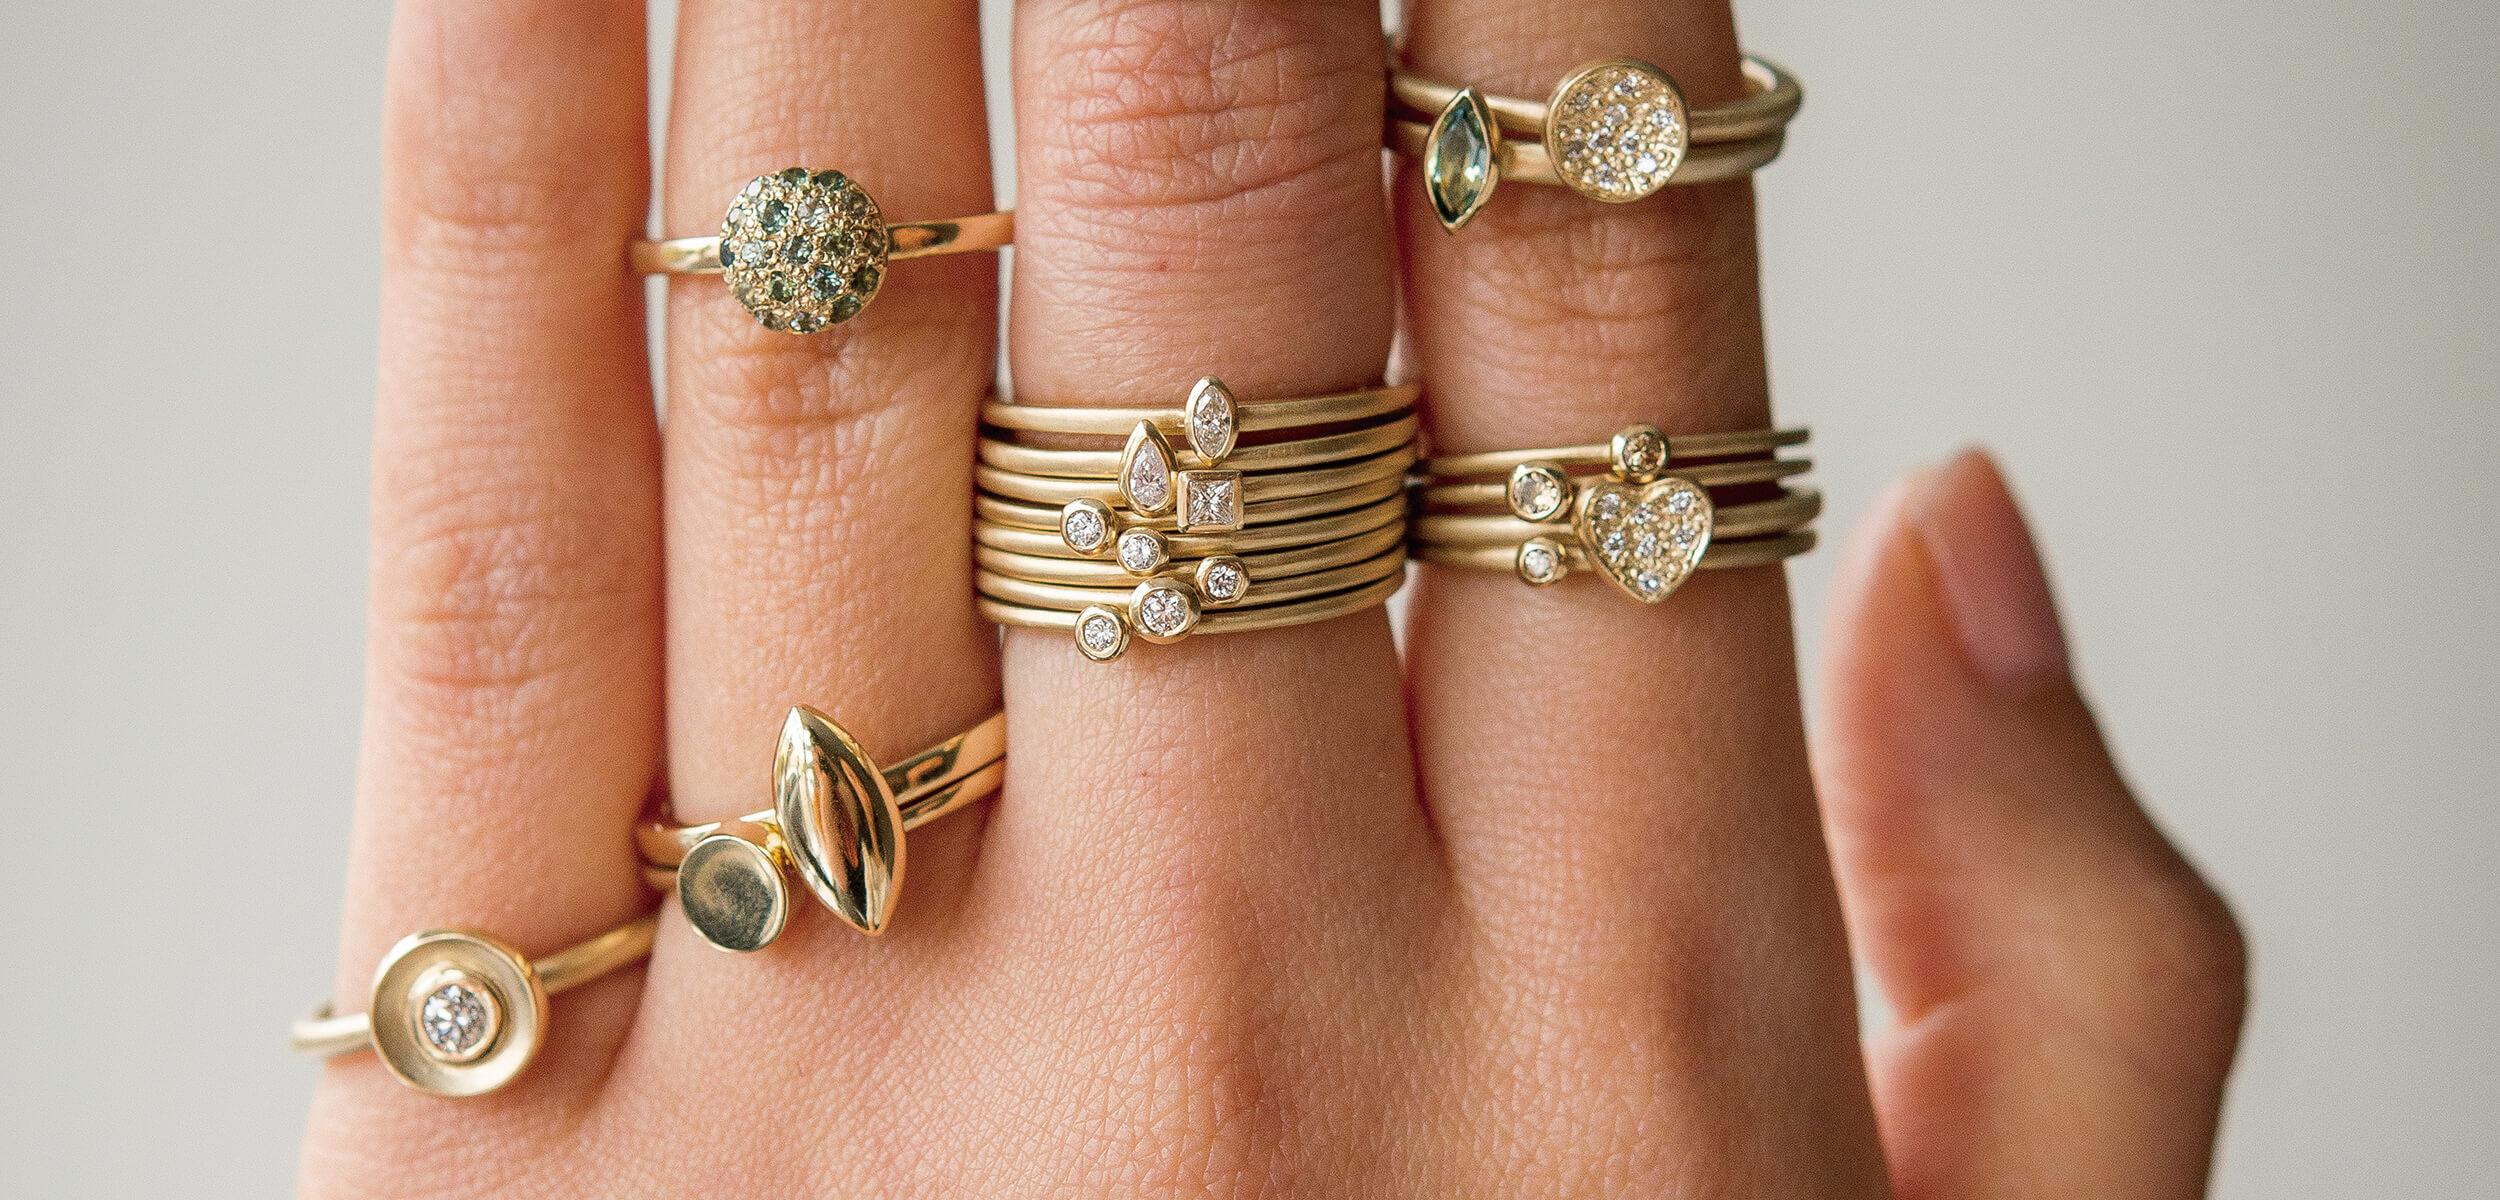 Clifton Rocks Diamond Sapphire Stacking Ring Bristol Handmade Independent Jewellery Shop